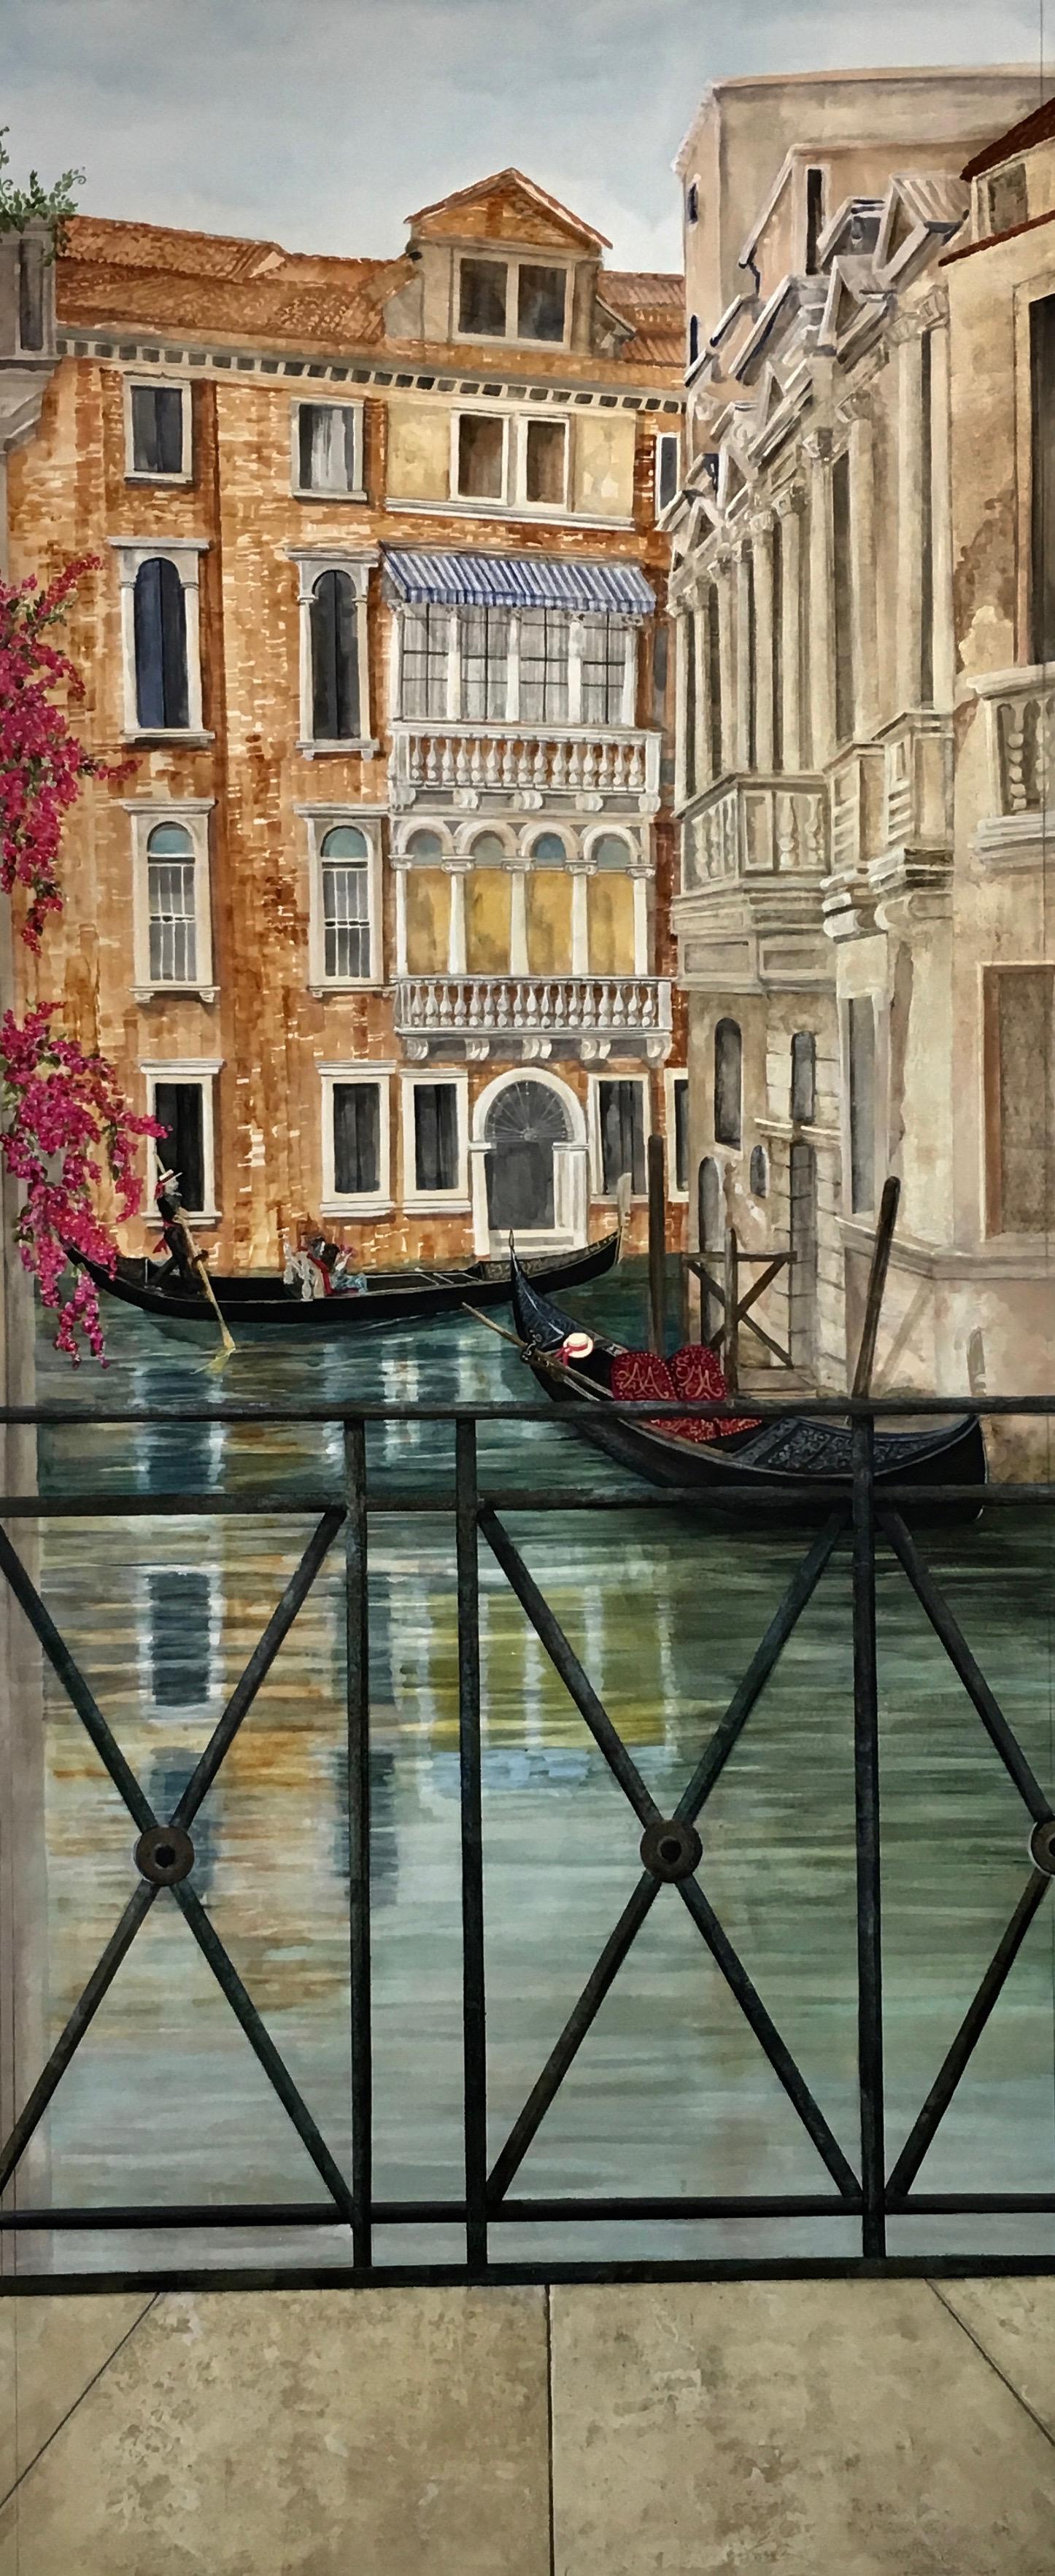 Venice Mural